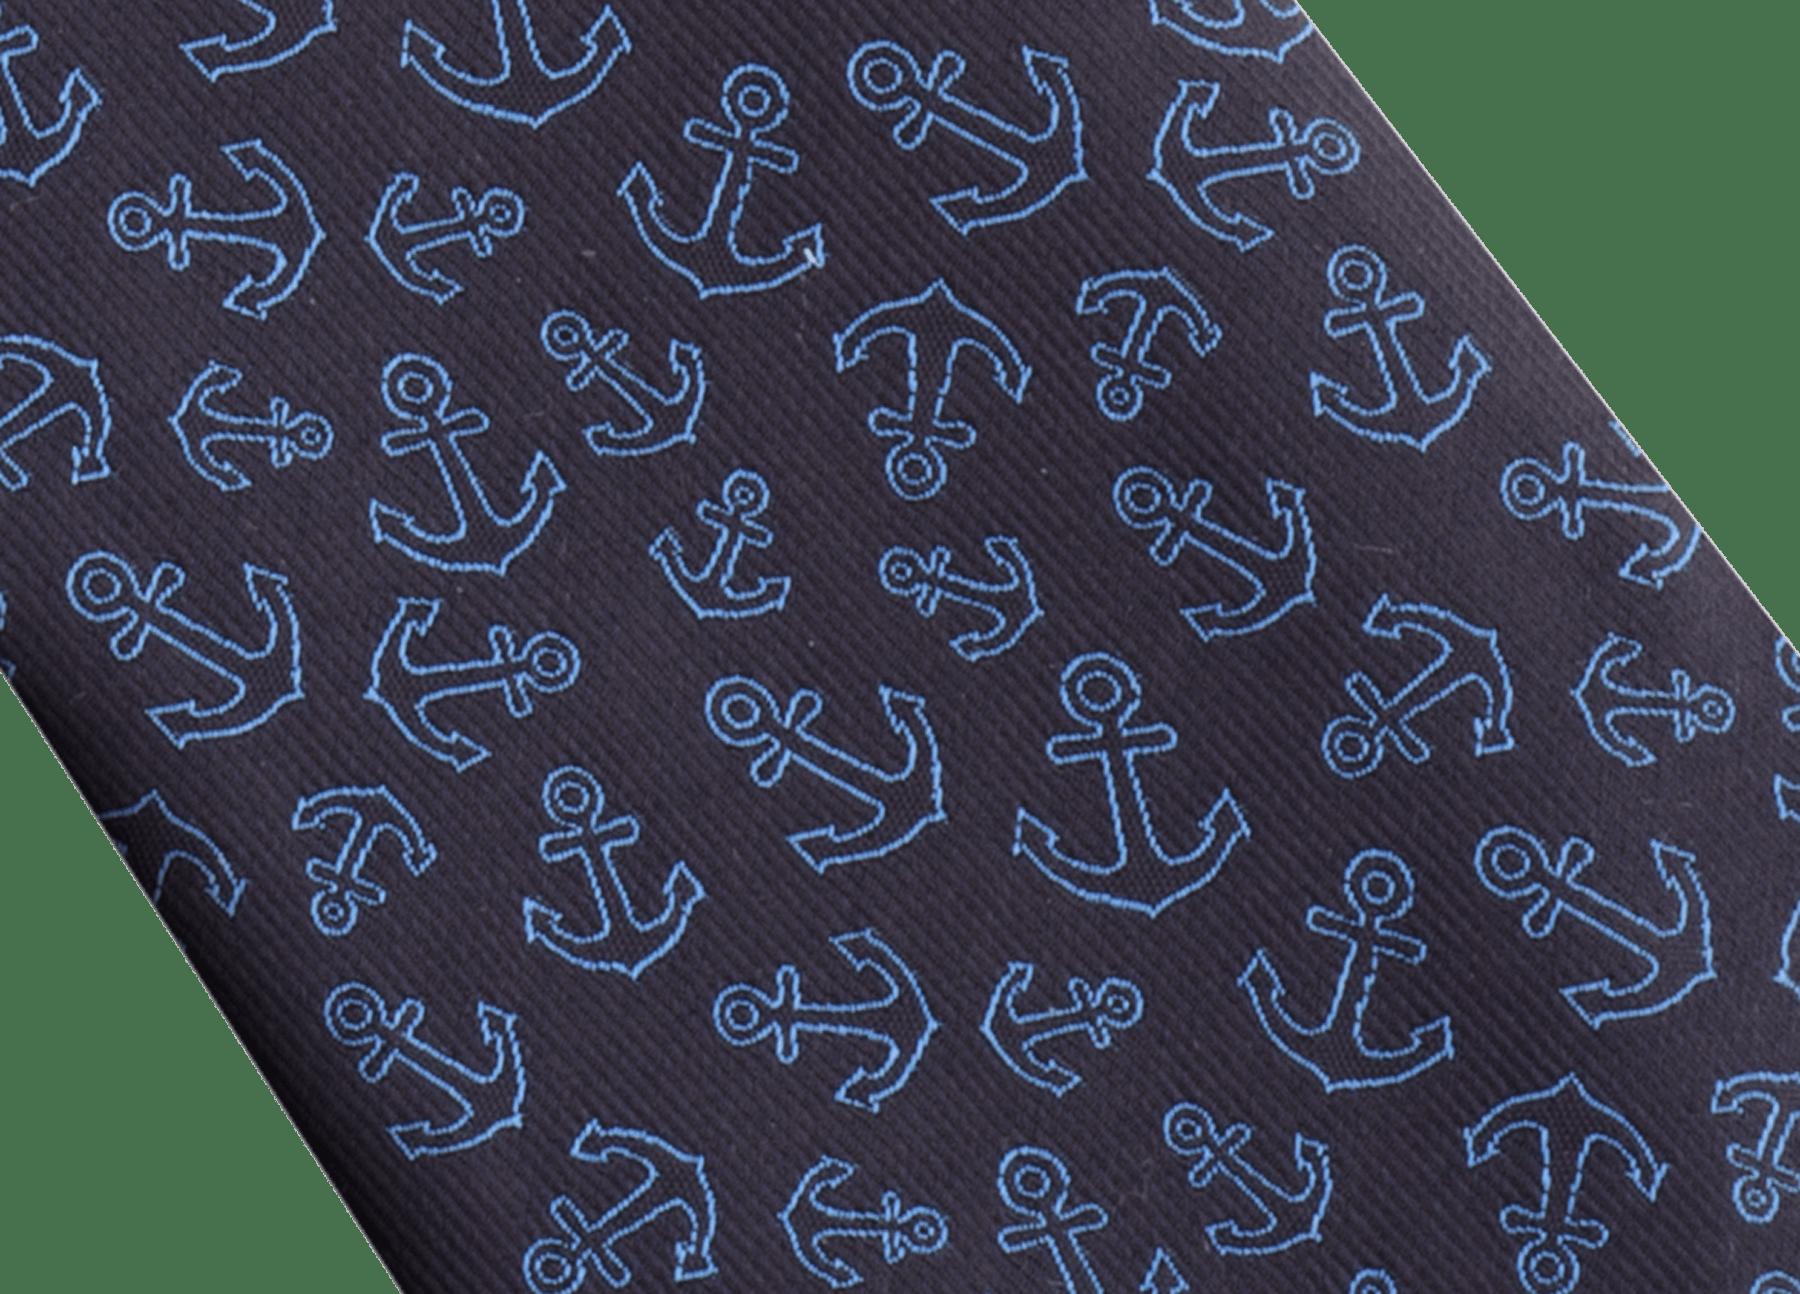 Галстук синего цвета, тонкий шелк, узор Double Cruise. 244113 image 2